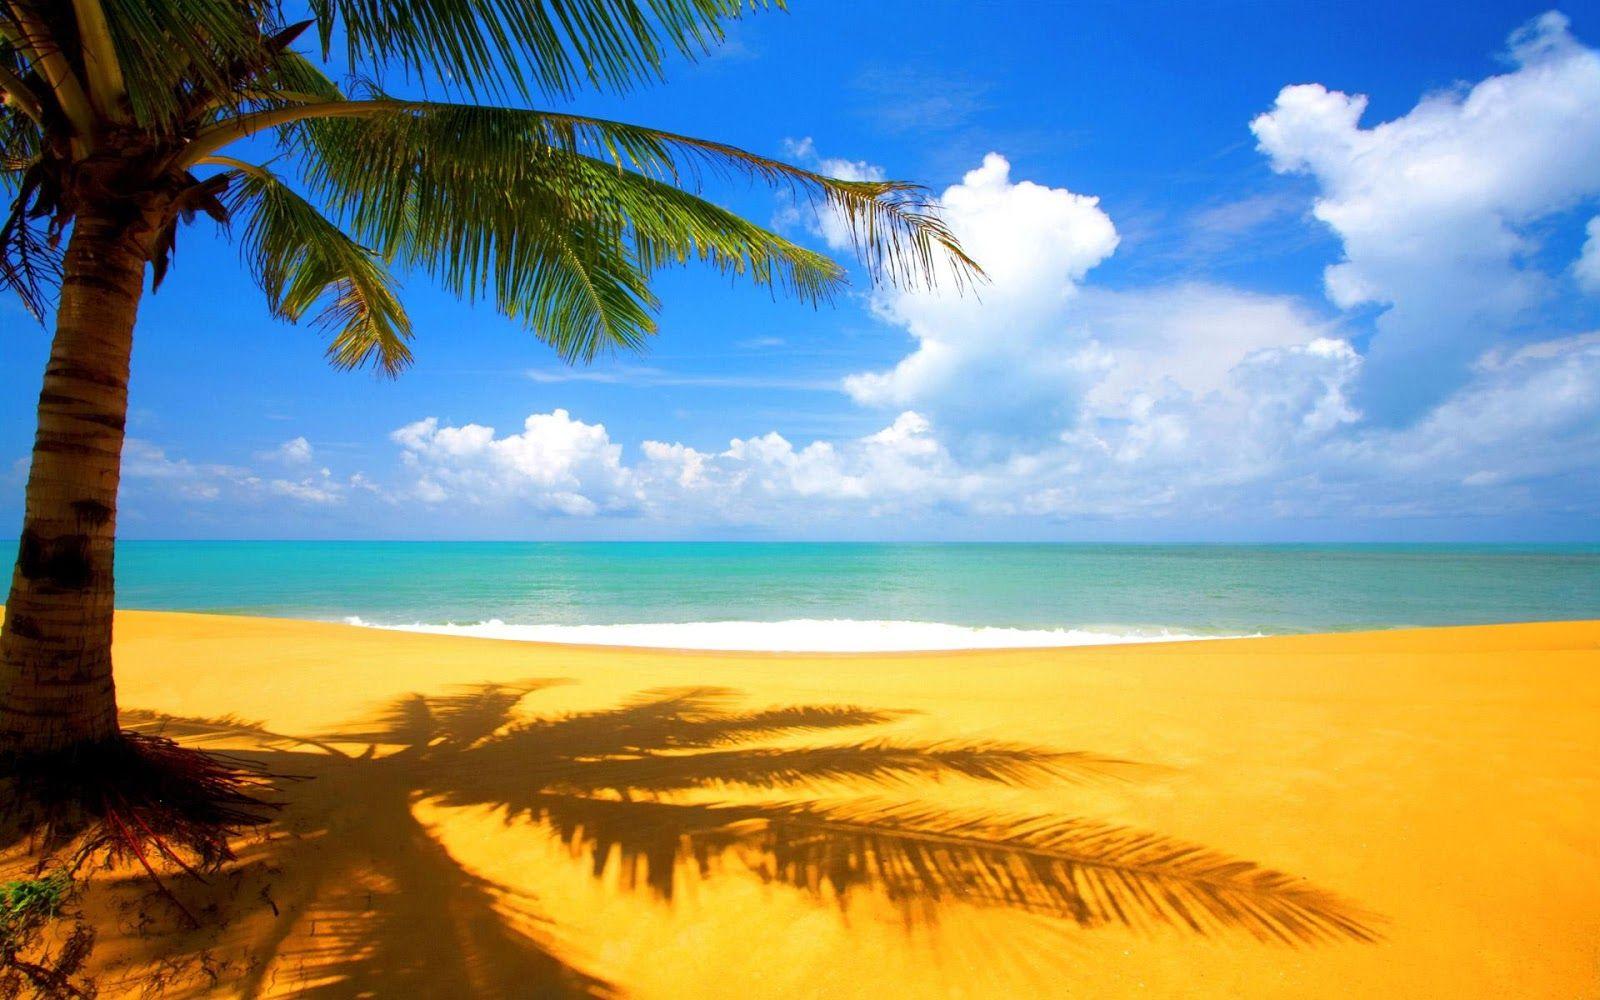 Ganti Wallpaper Komputer Kamu Sekarang Dengan Gambar Pantai Pemandangan Di Pantai Latar Belakang